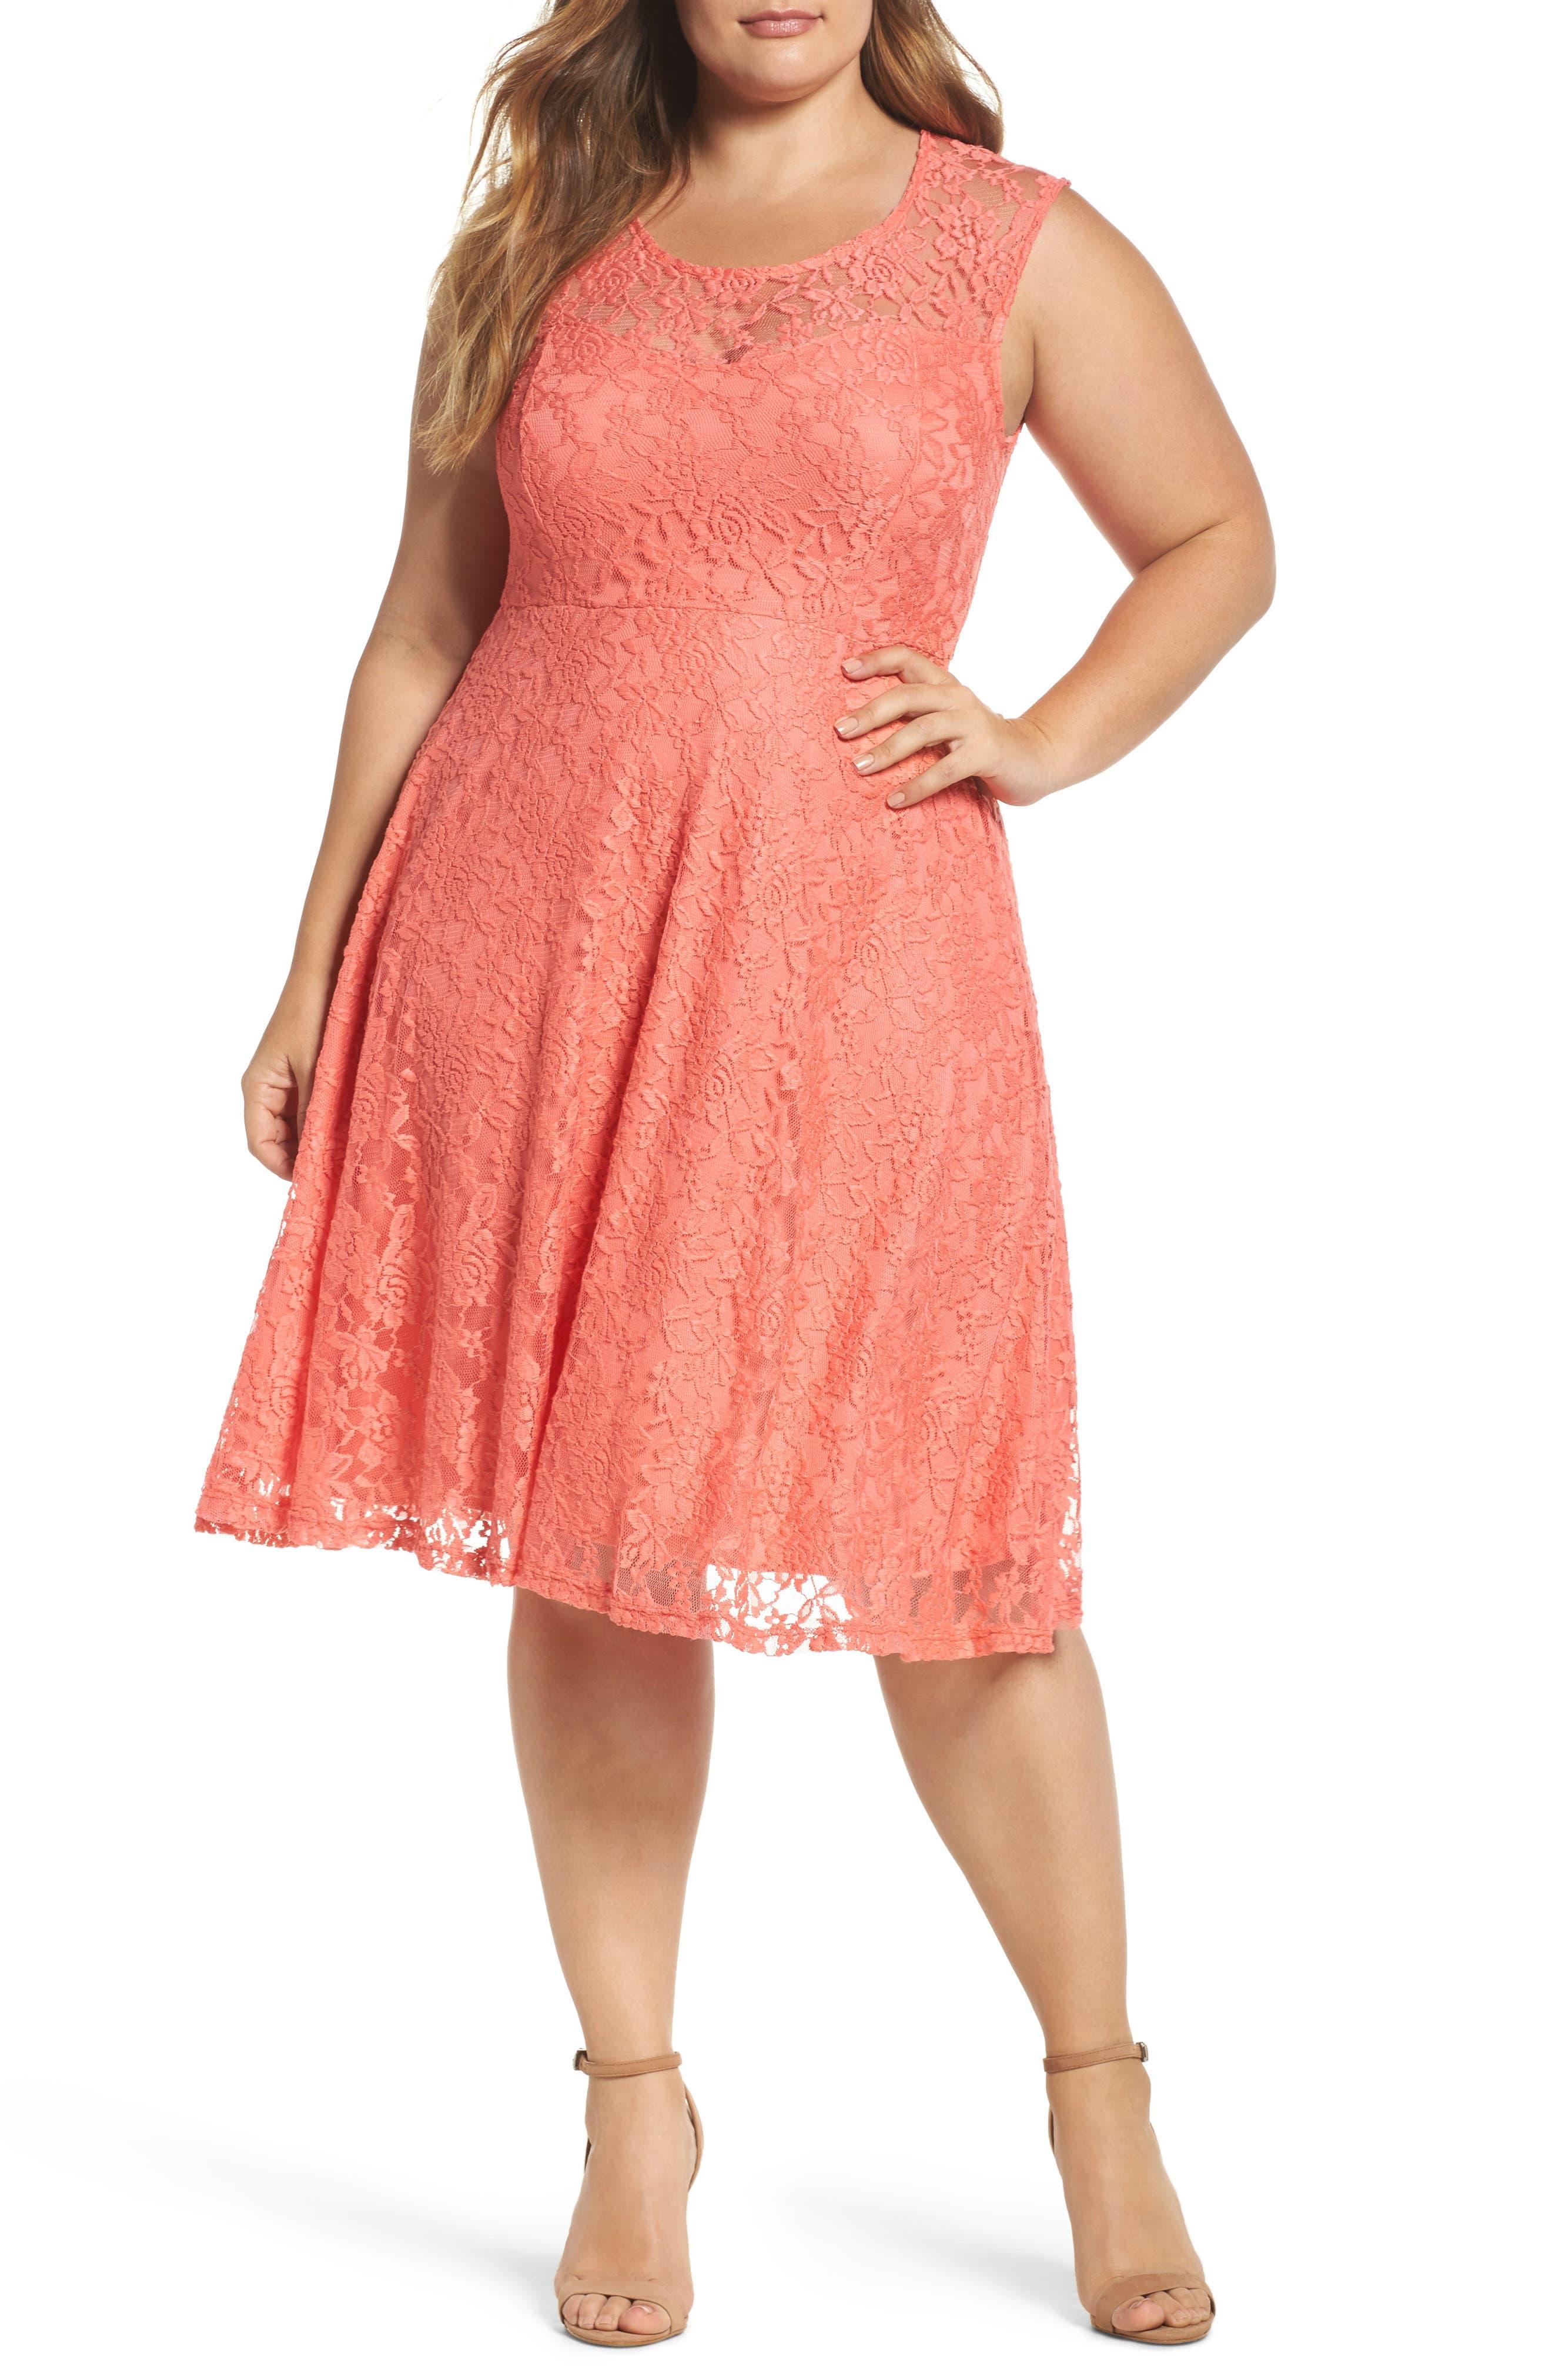 Lace Skater Dress,                             Main thumbnail 1, color,                             Coral